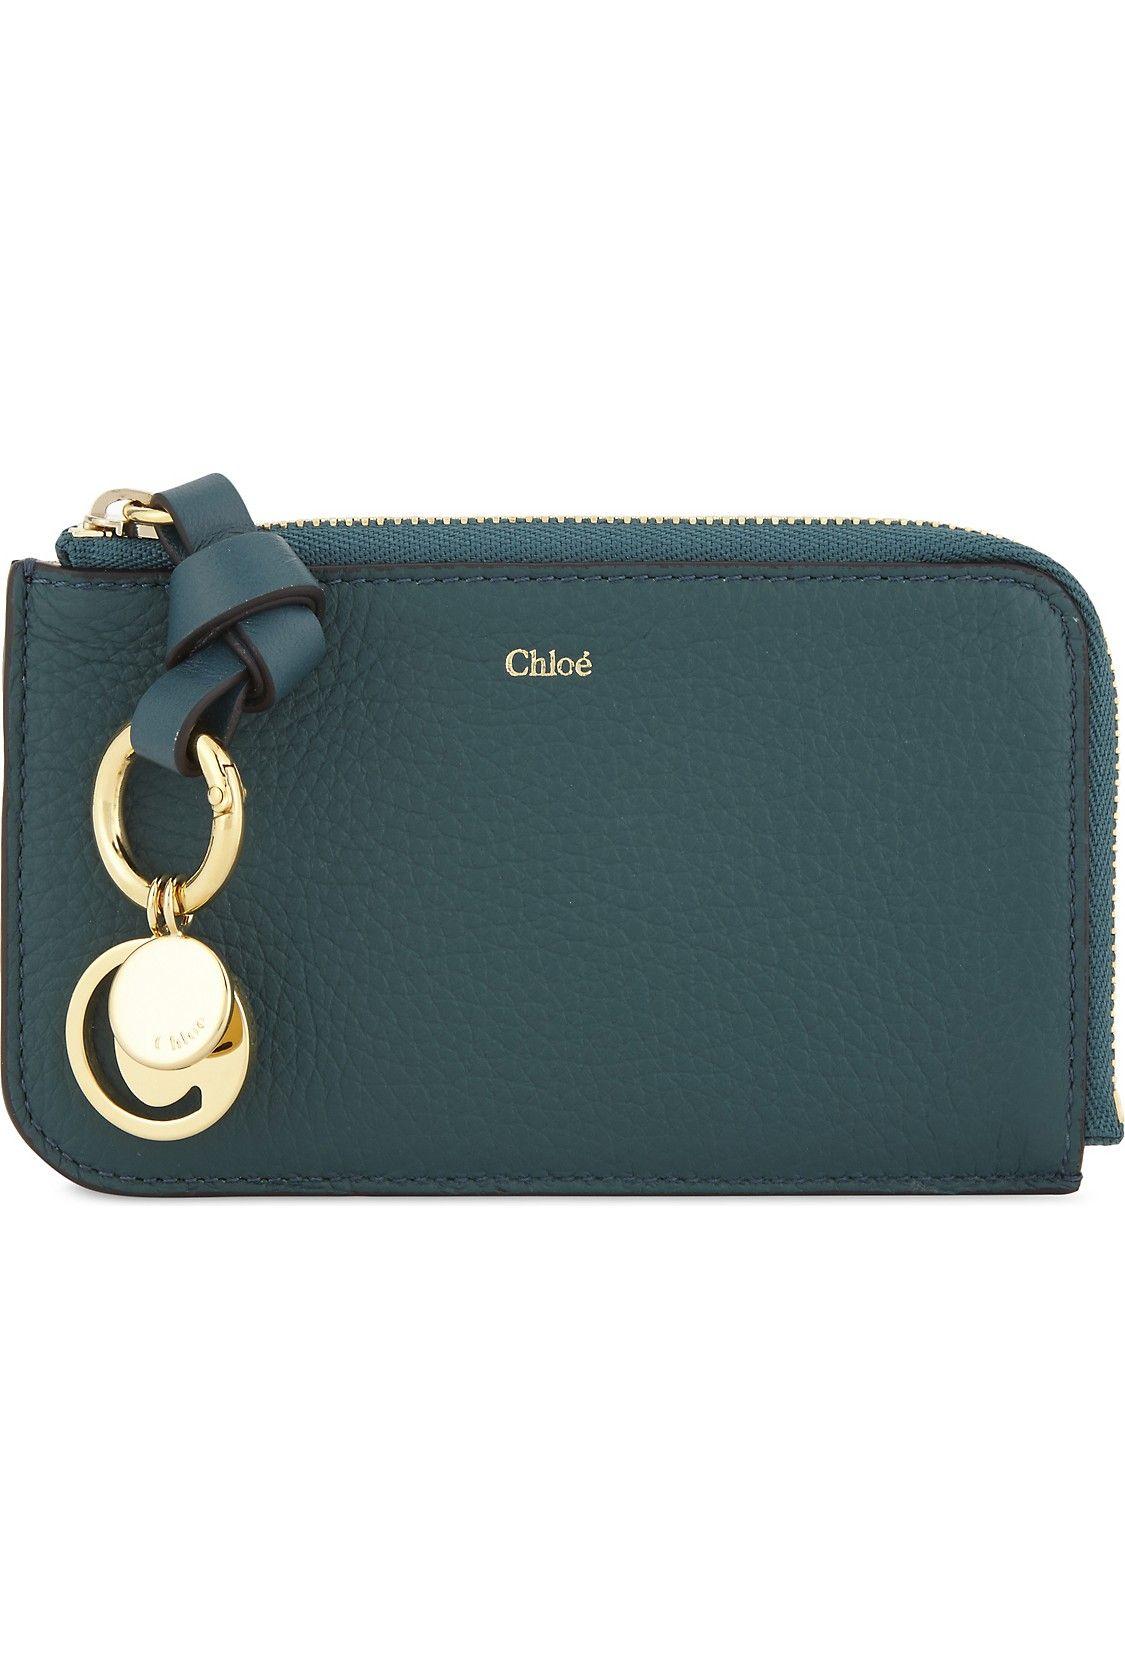 chloe abc grained leather card holder selfridgescom - Chloe Card Holder